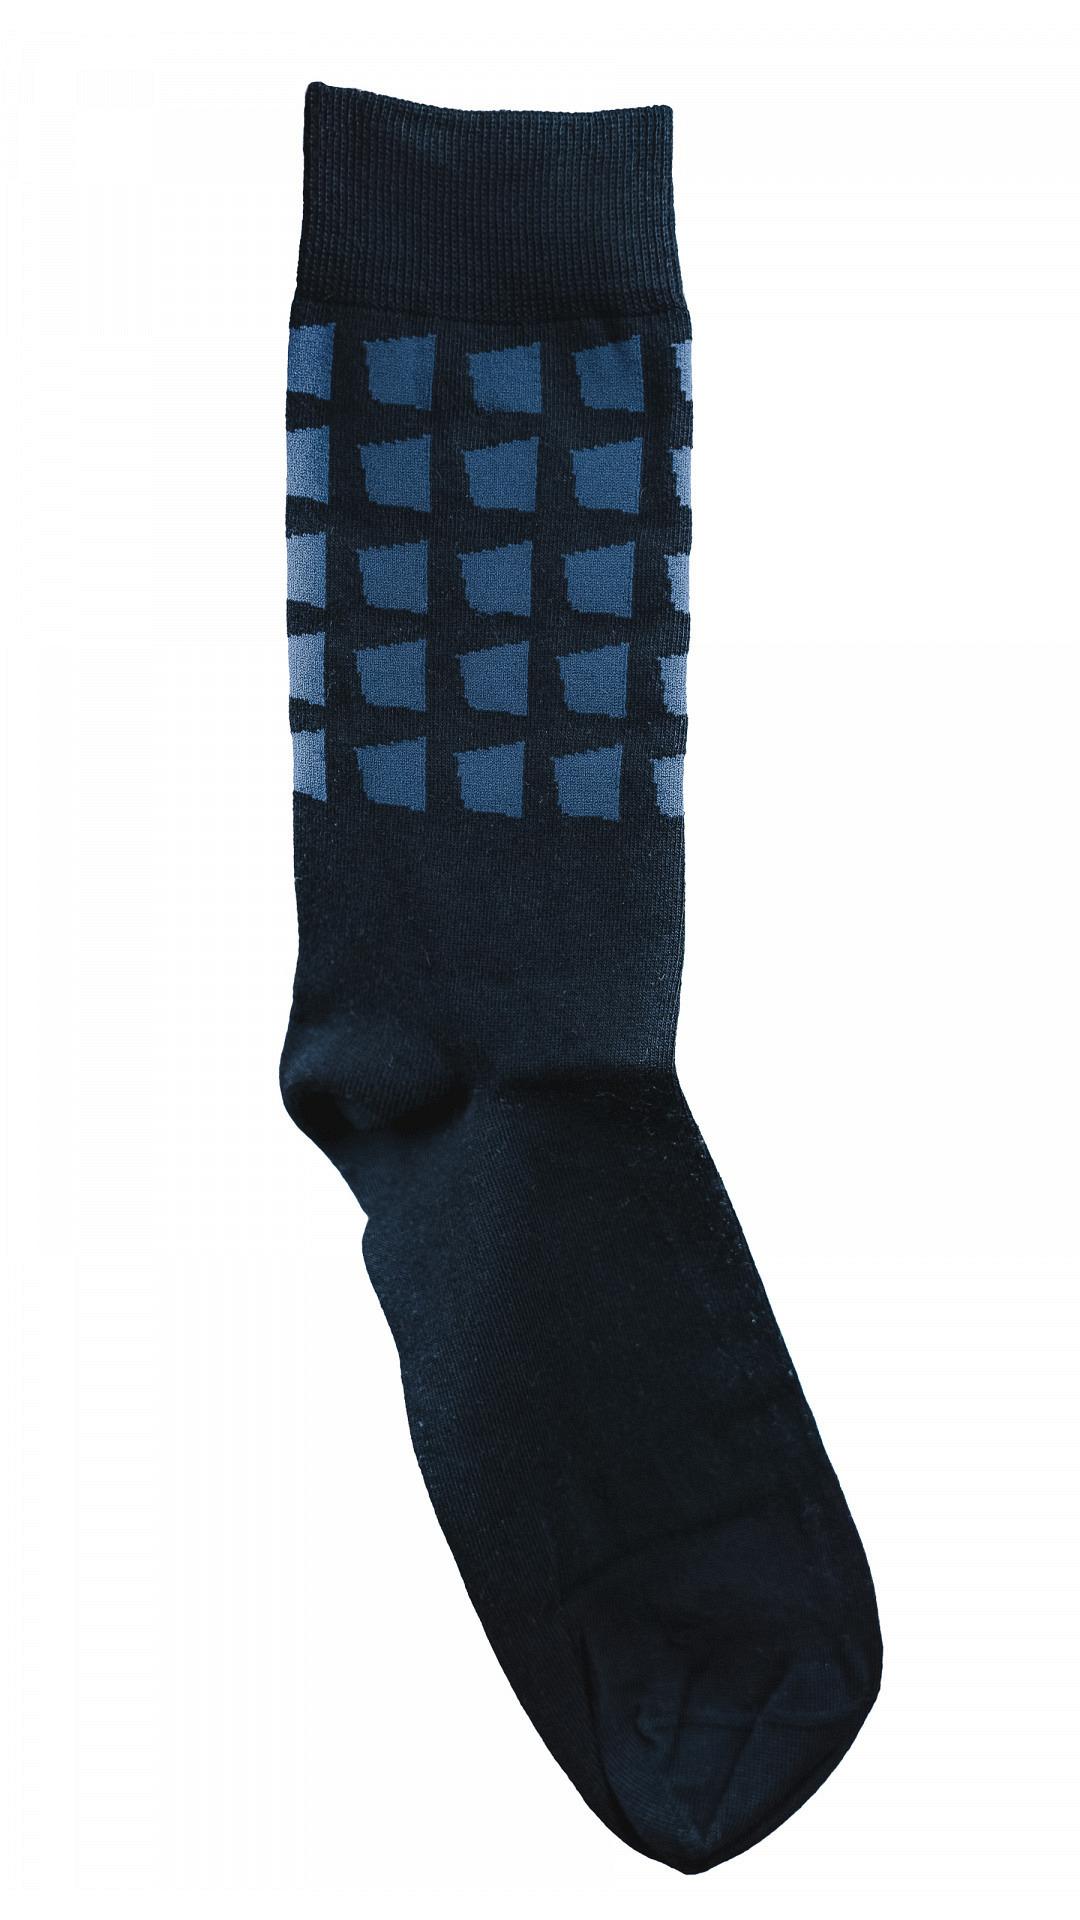 HSG Socken schwarz